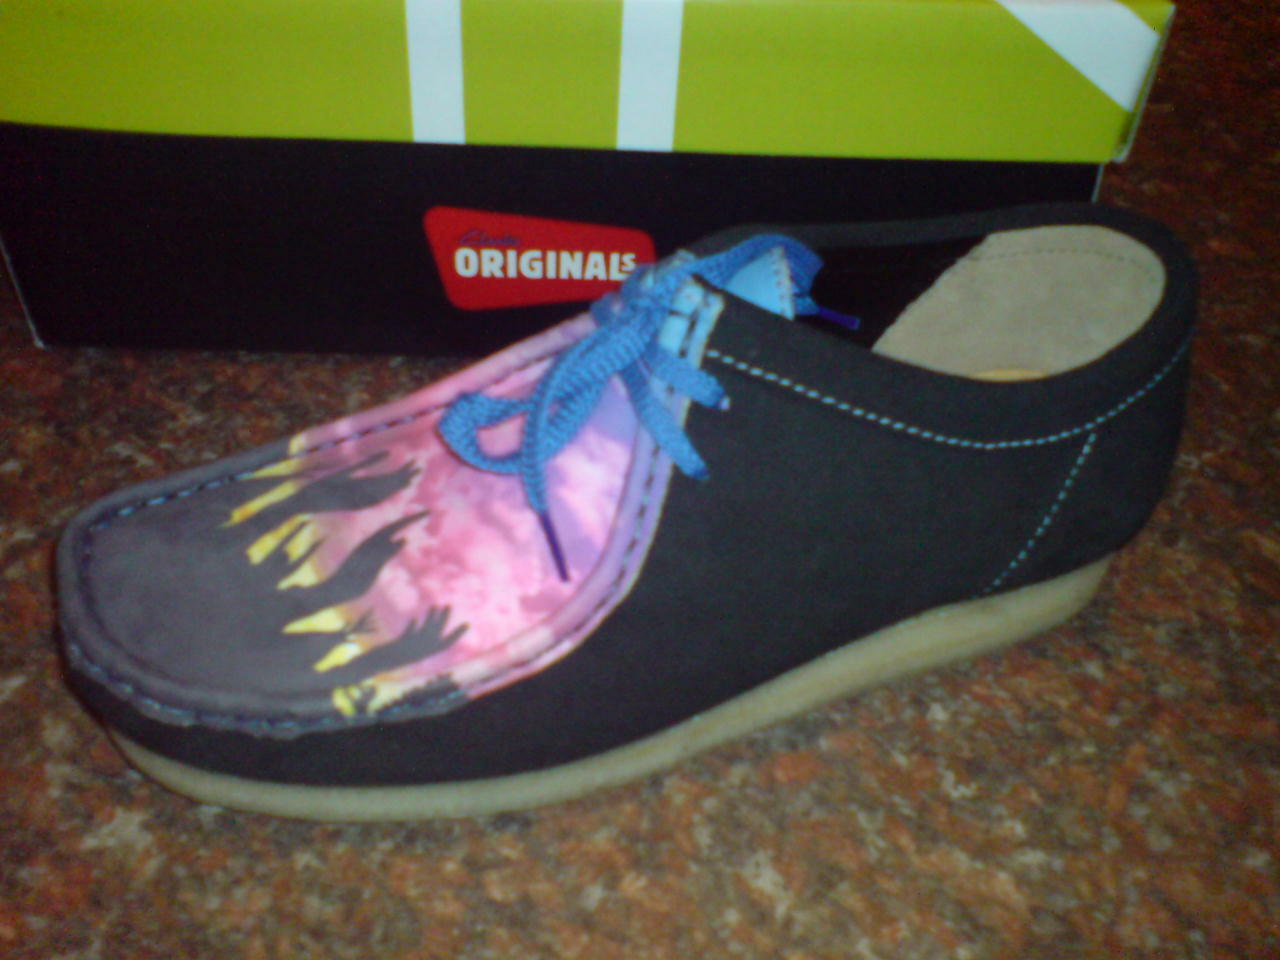 Clarks Originals   X WALLABEES  BLACK MULTI , Leather shoes    UK 9.5